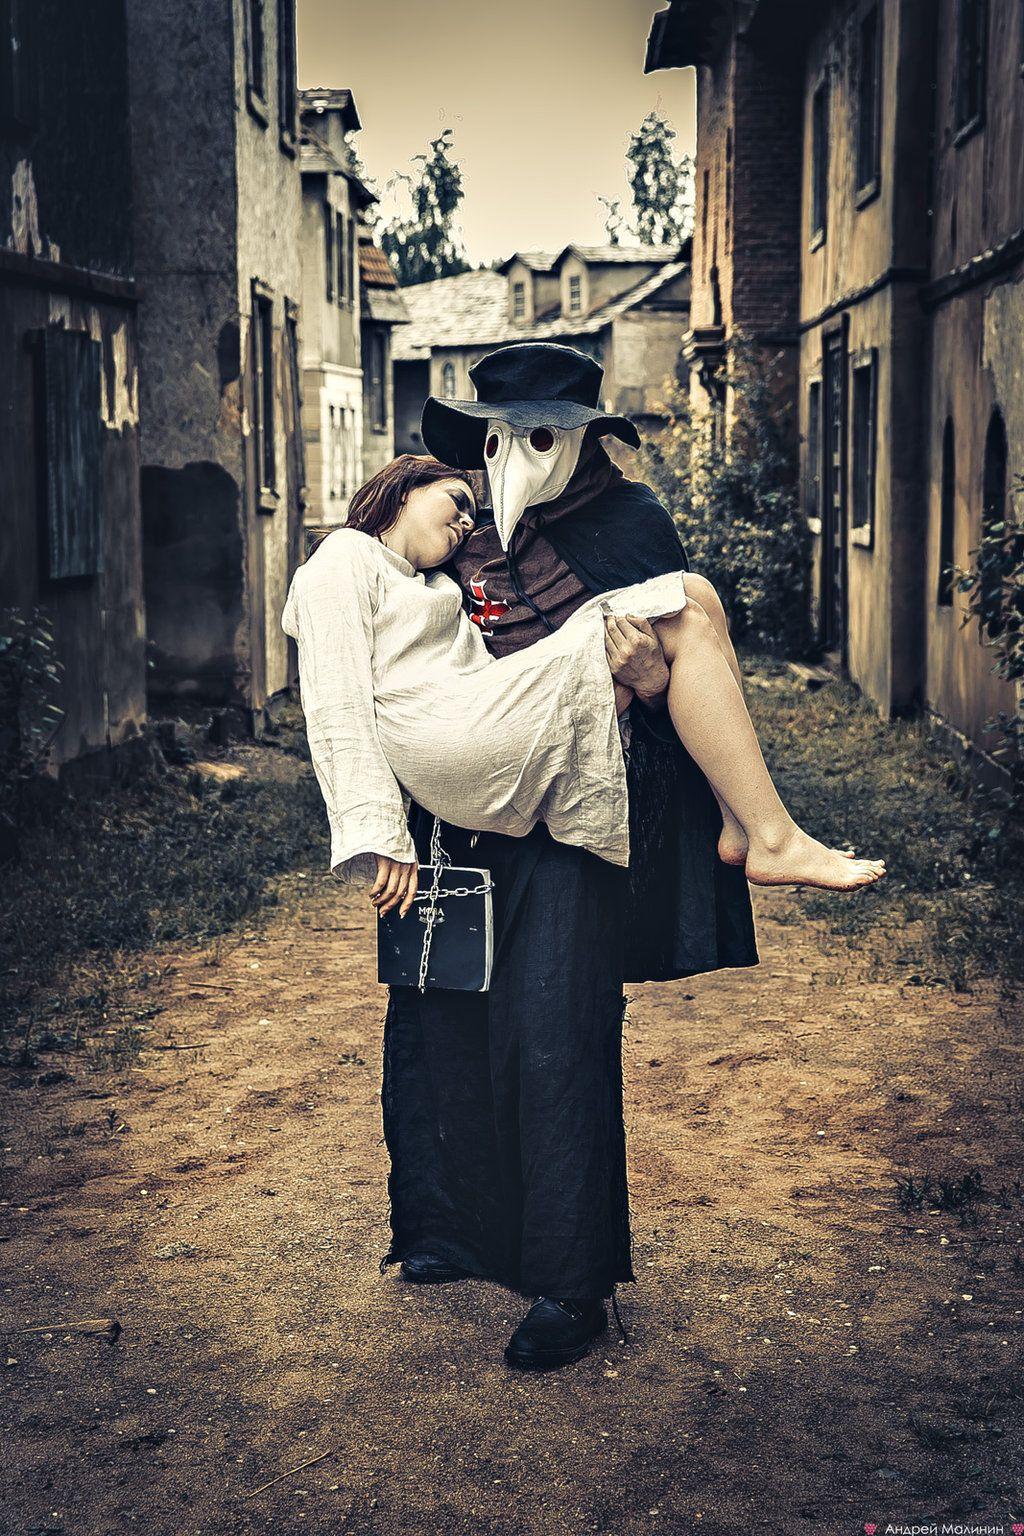 Plague doctor 5 by Agcooper73.deviantart.com on @DeviantArt